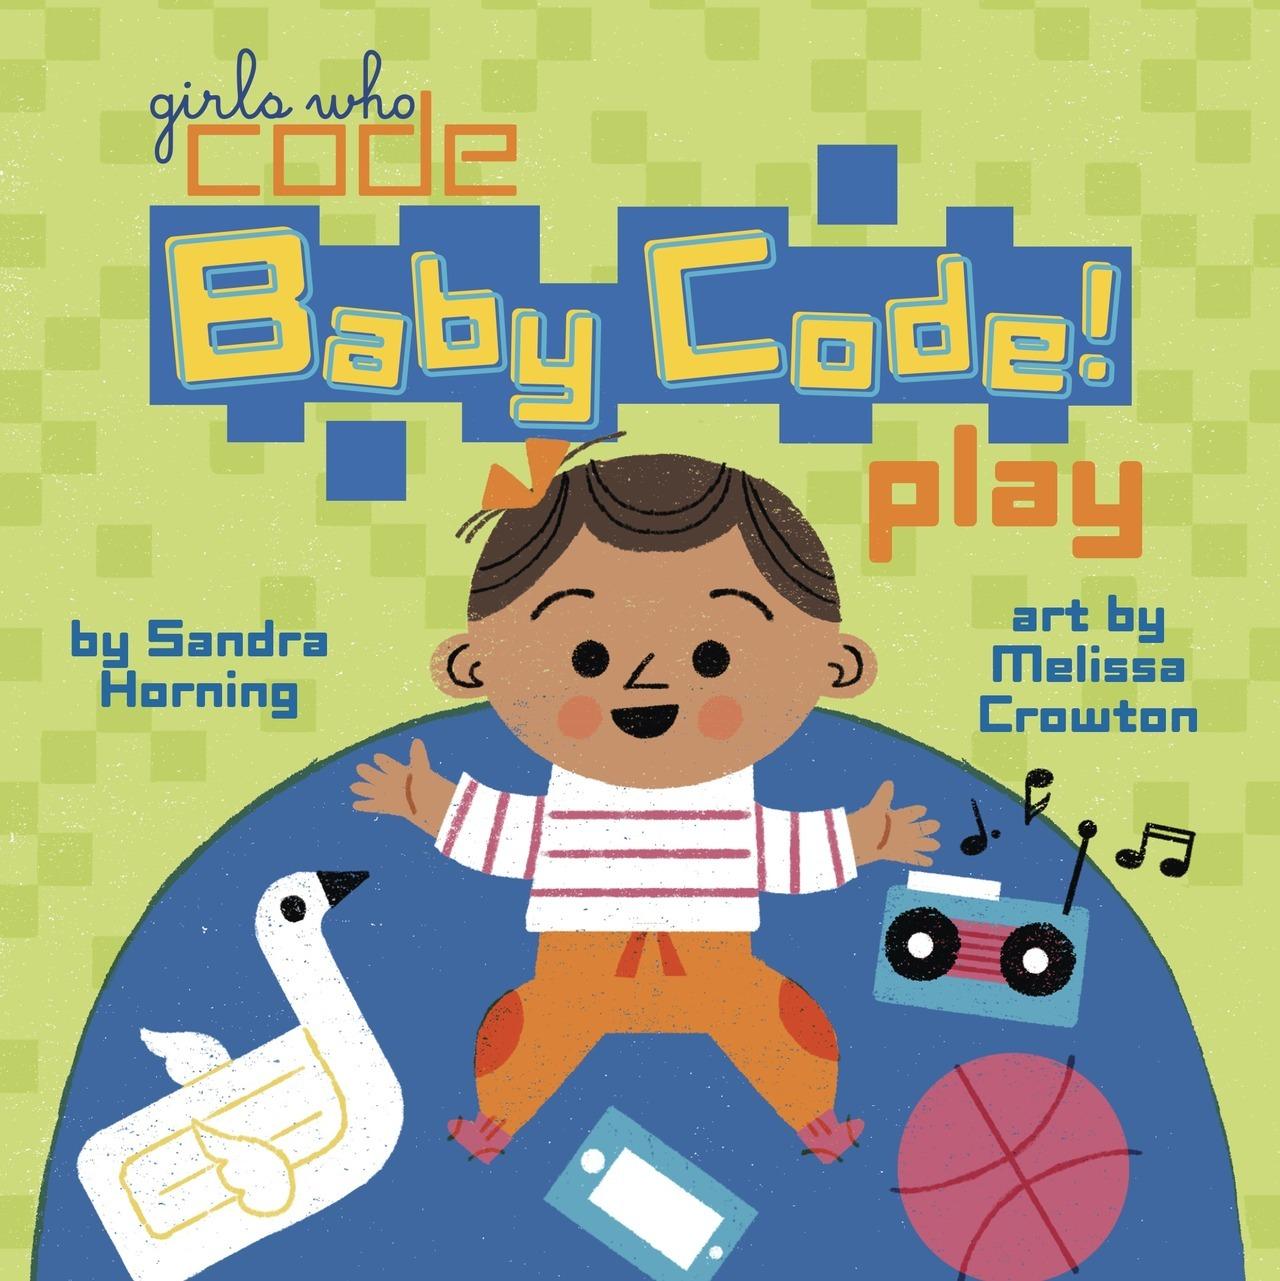 Baby Code: Play